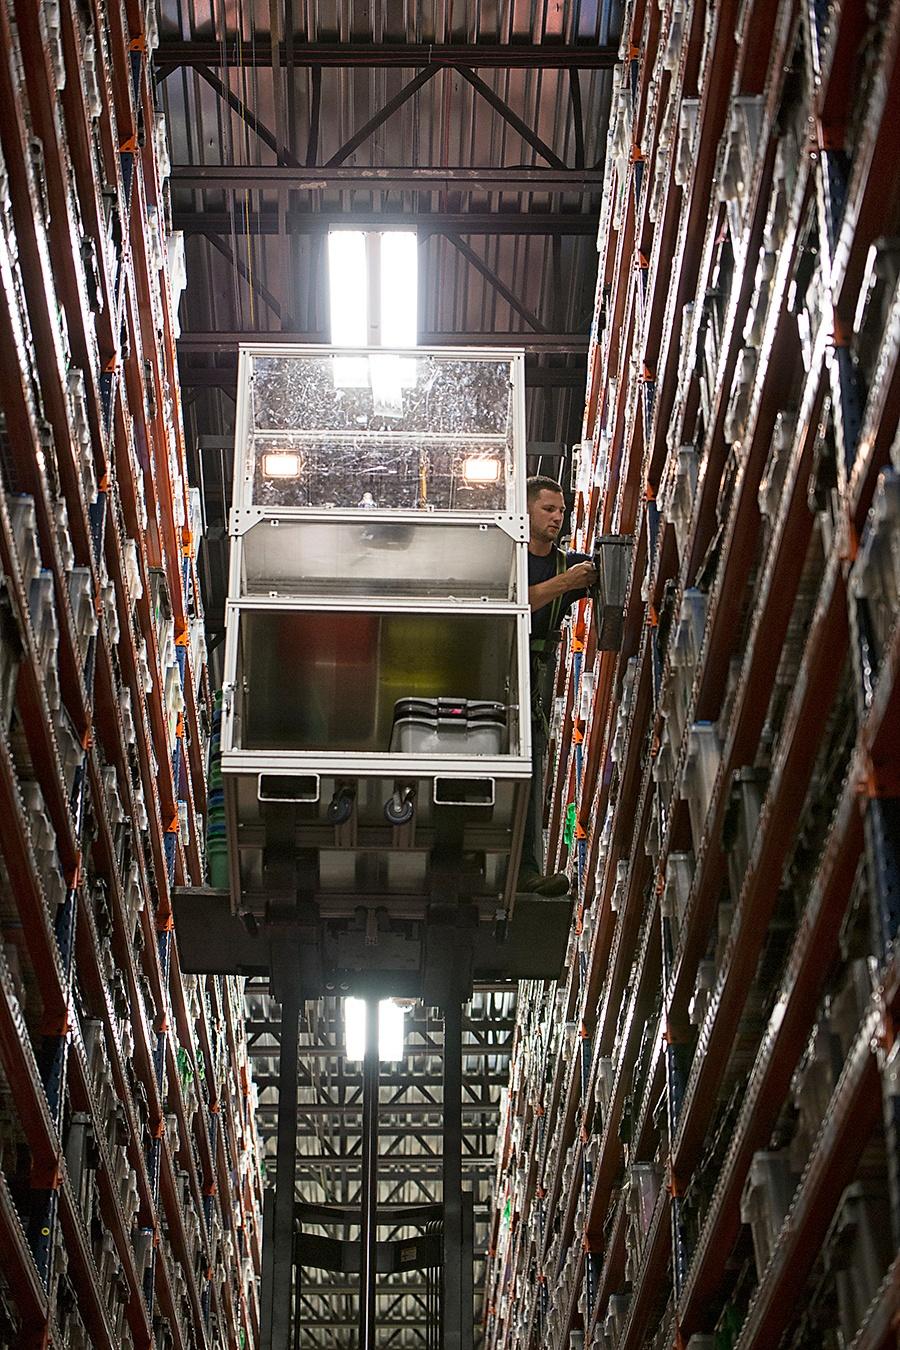 High Lift Picker in Warehouse